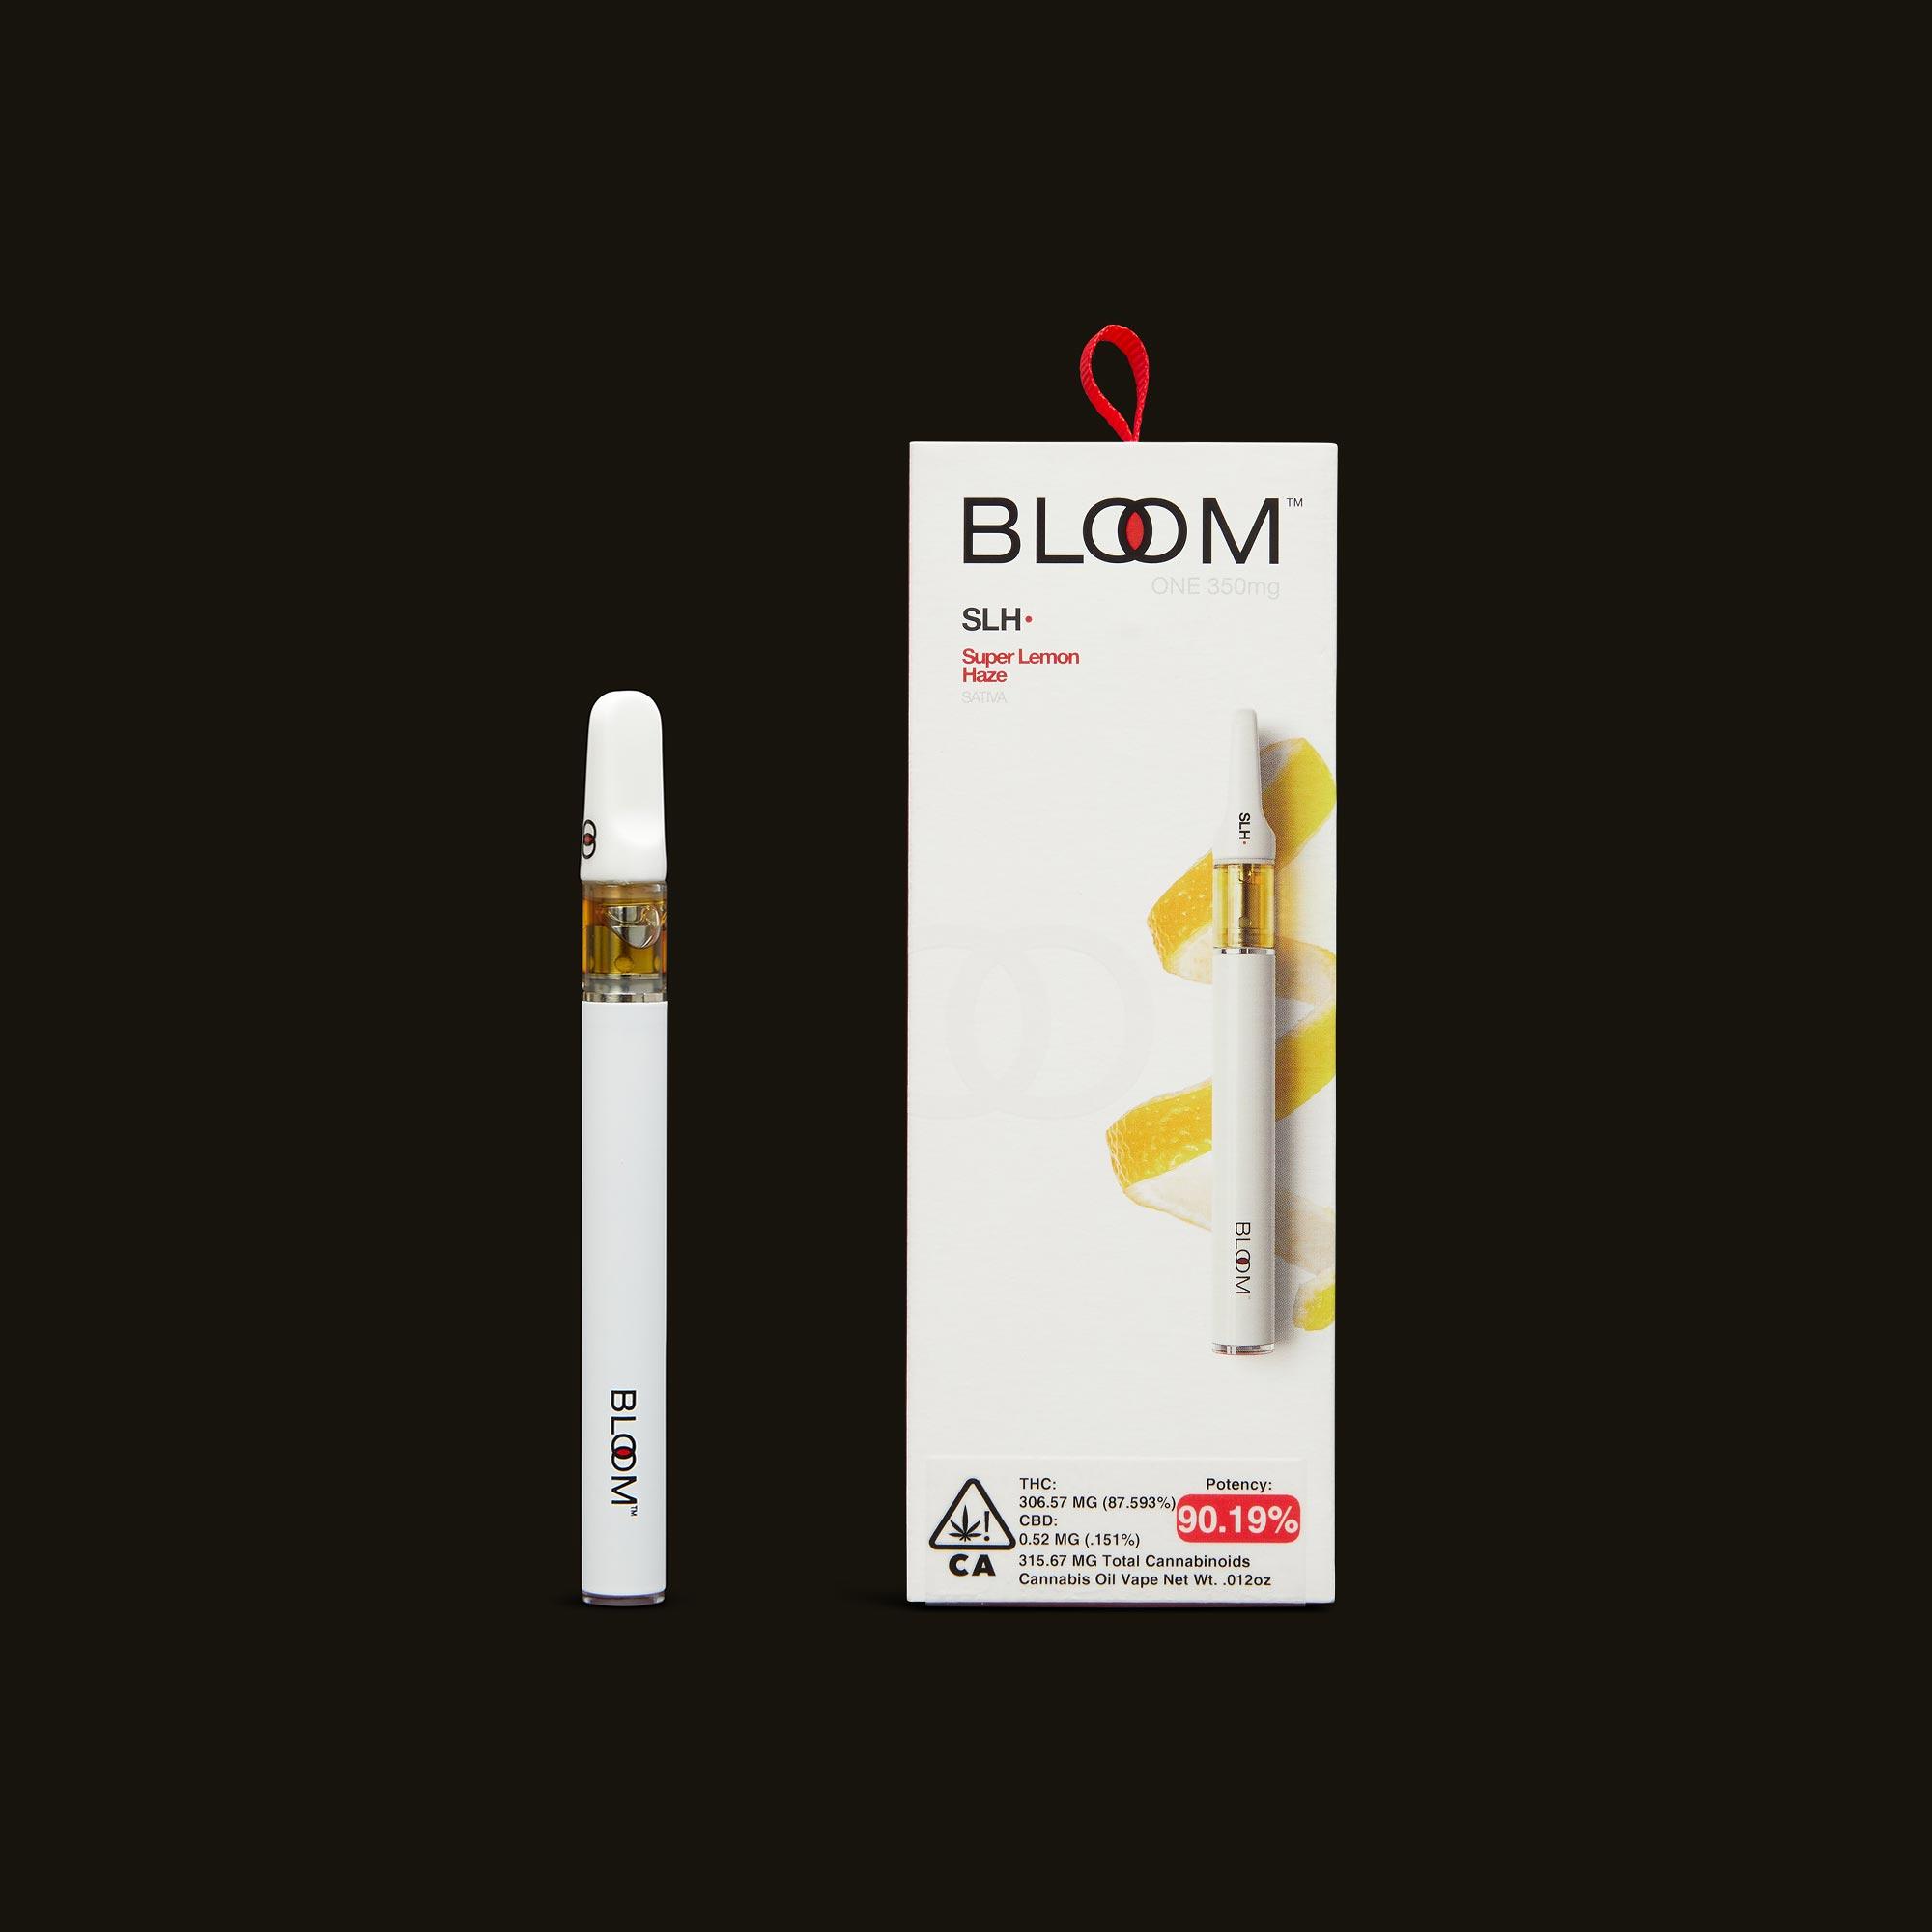 Super Lemon Haze Bloom One by Bloom Brands